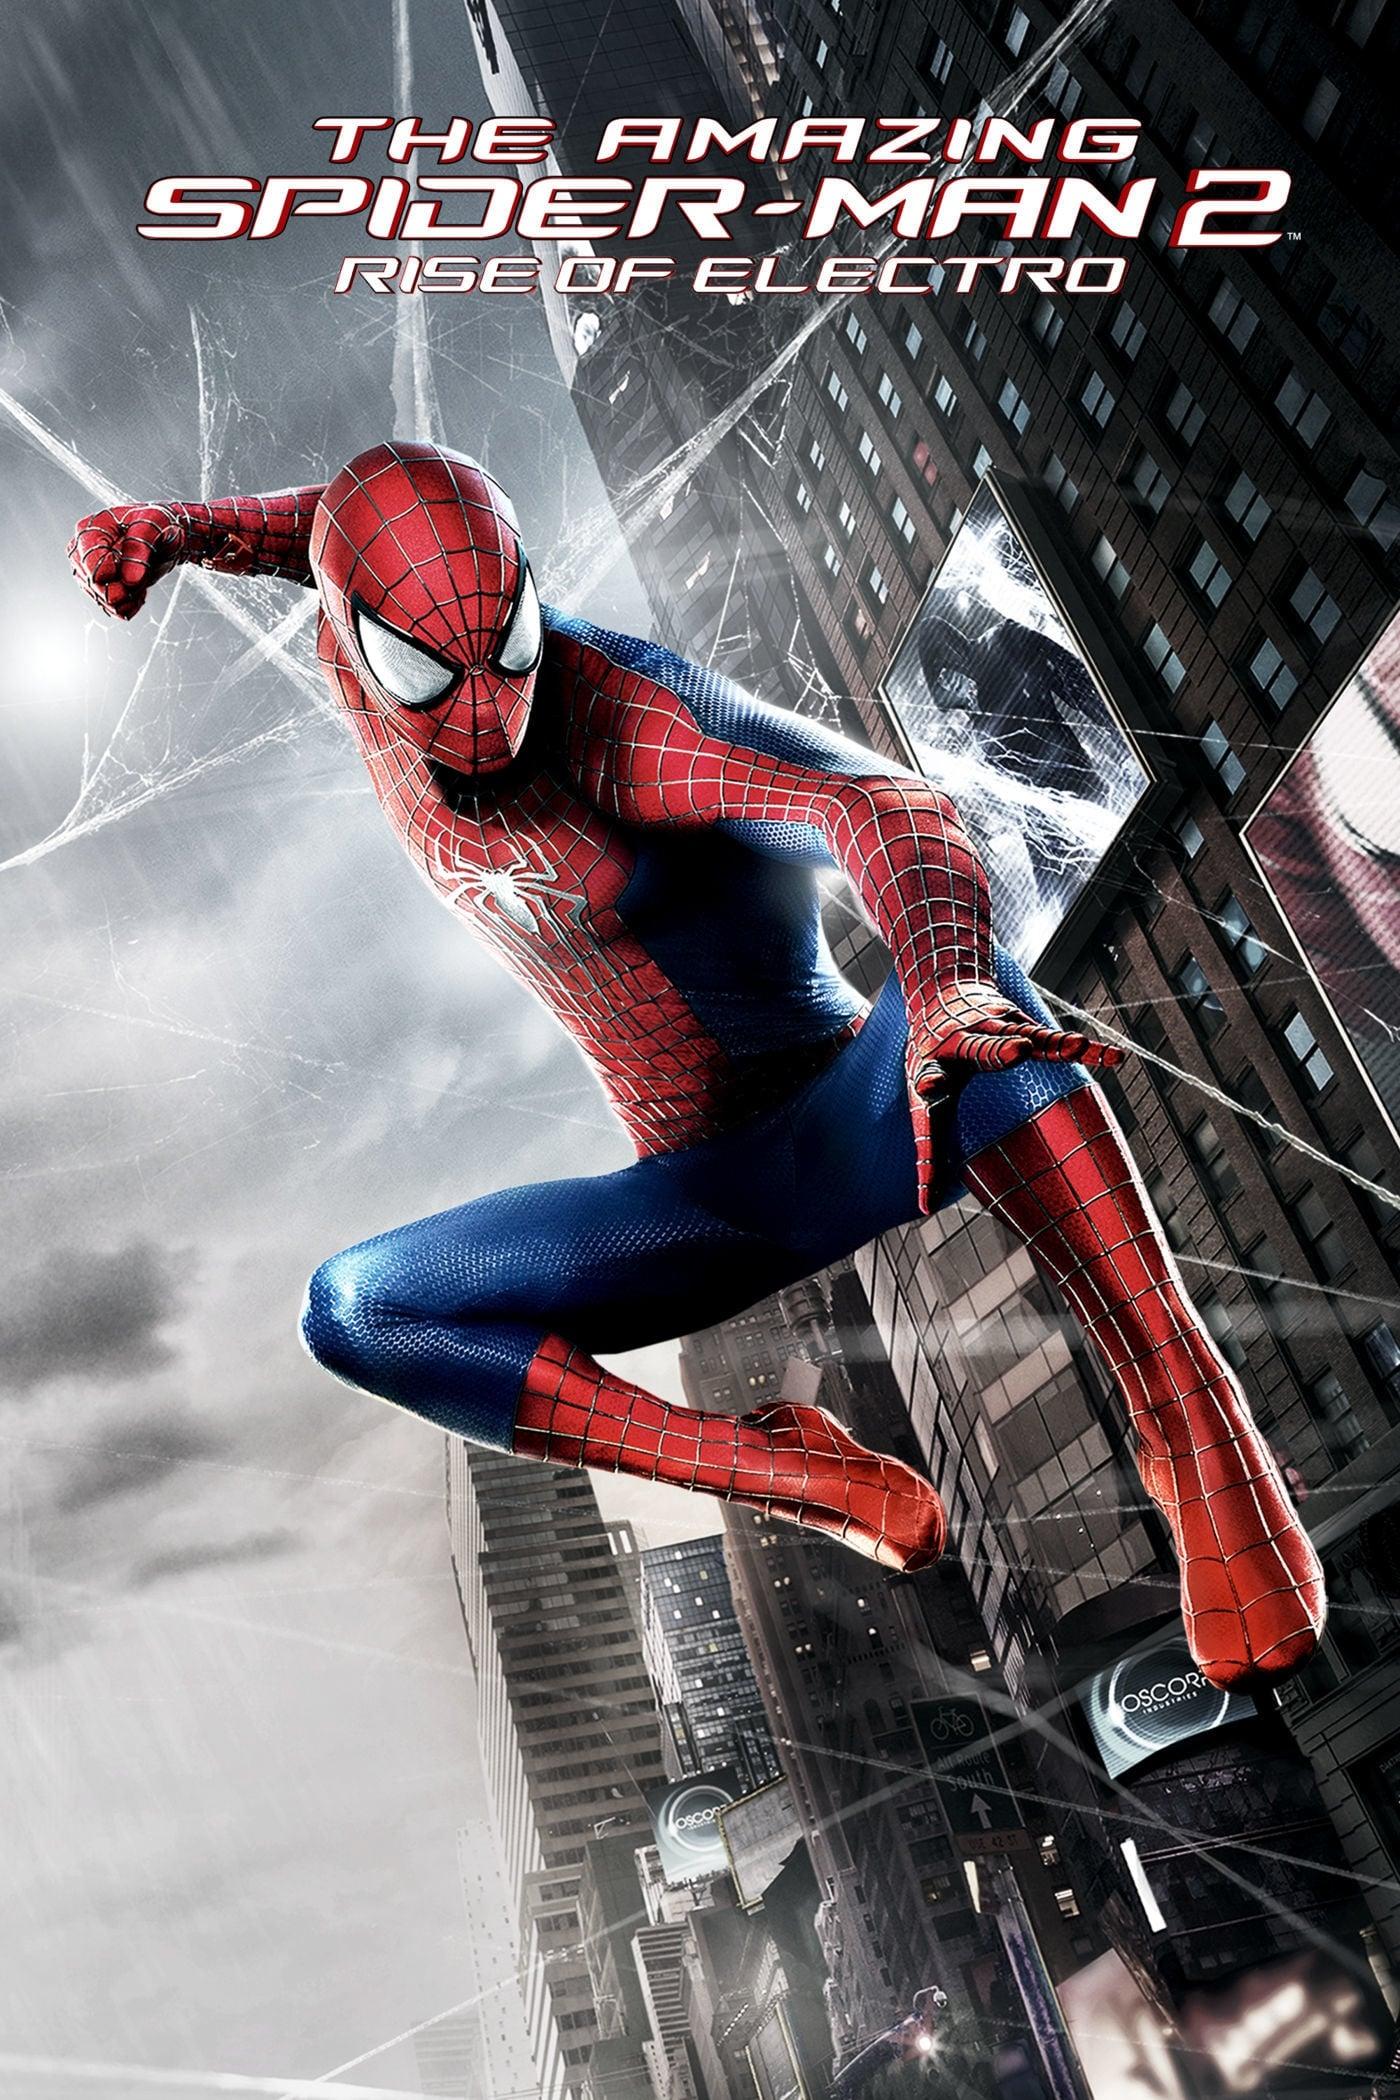 the amazing spider-man 2 stream kinox